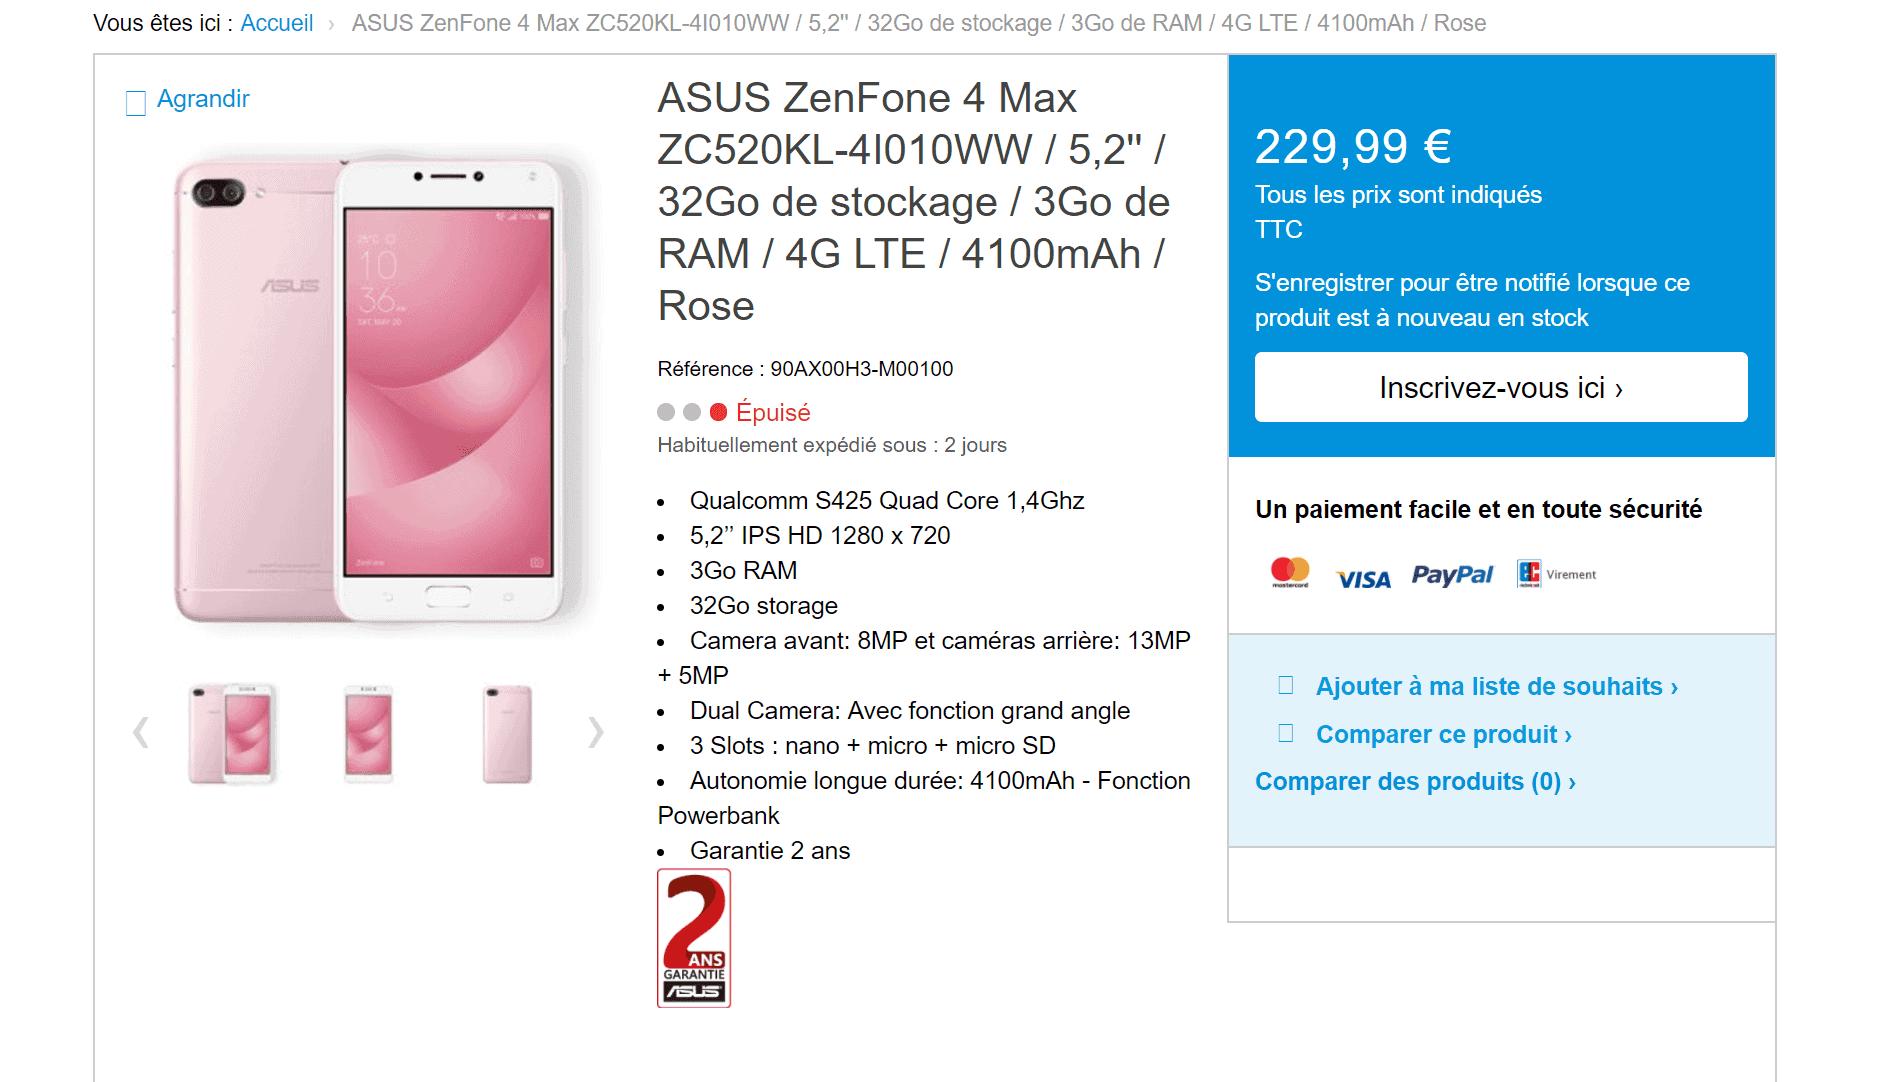 ZenFone 4 Max ASUS Leak